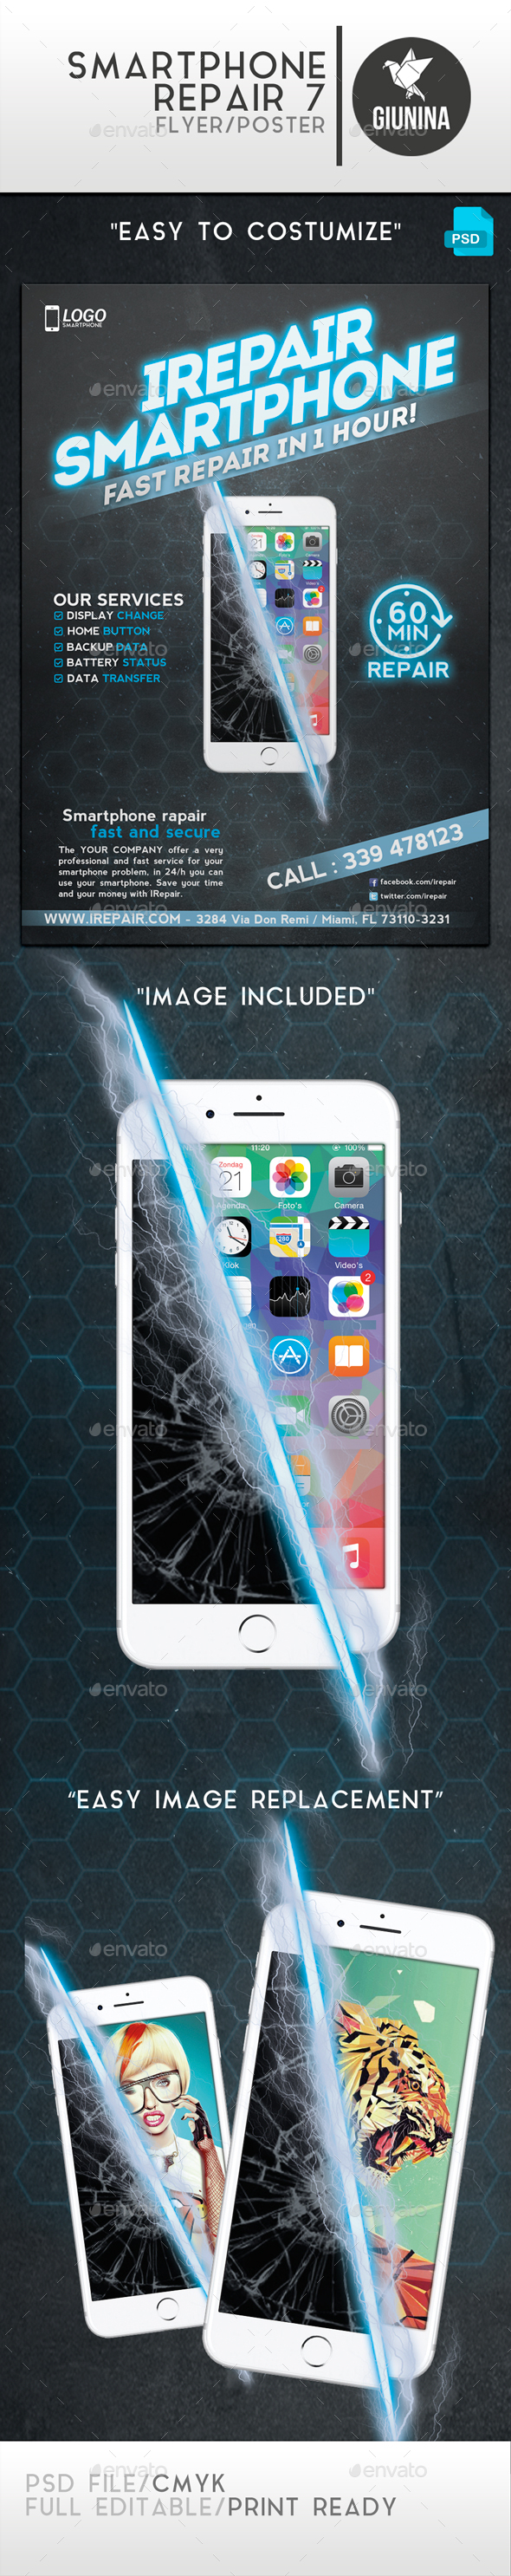 Smartphone Repair 7 Flyer/Poster - Commerce Flyers